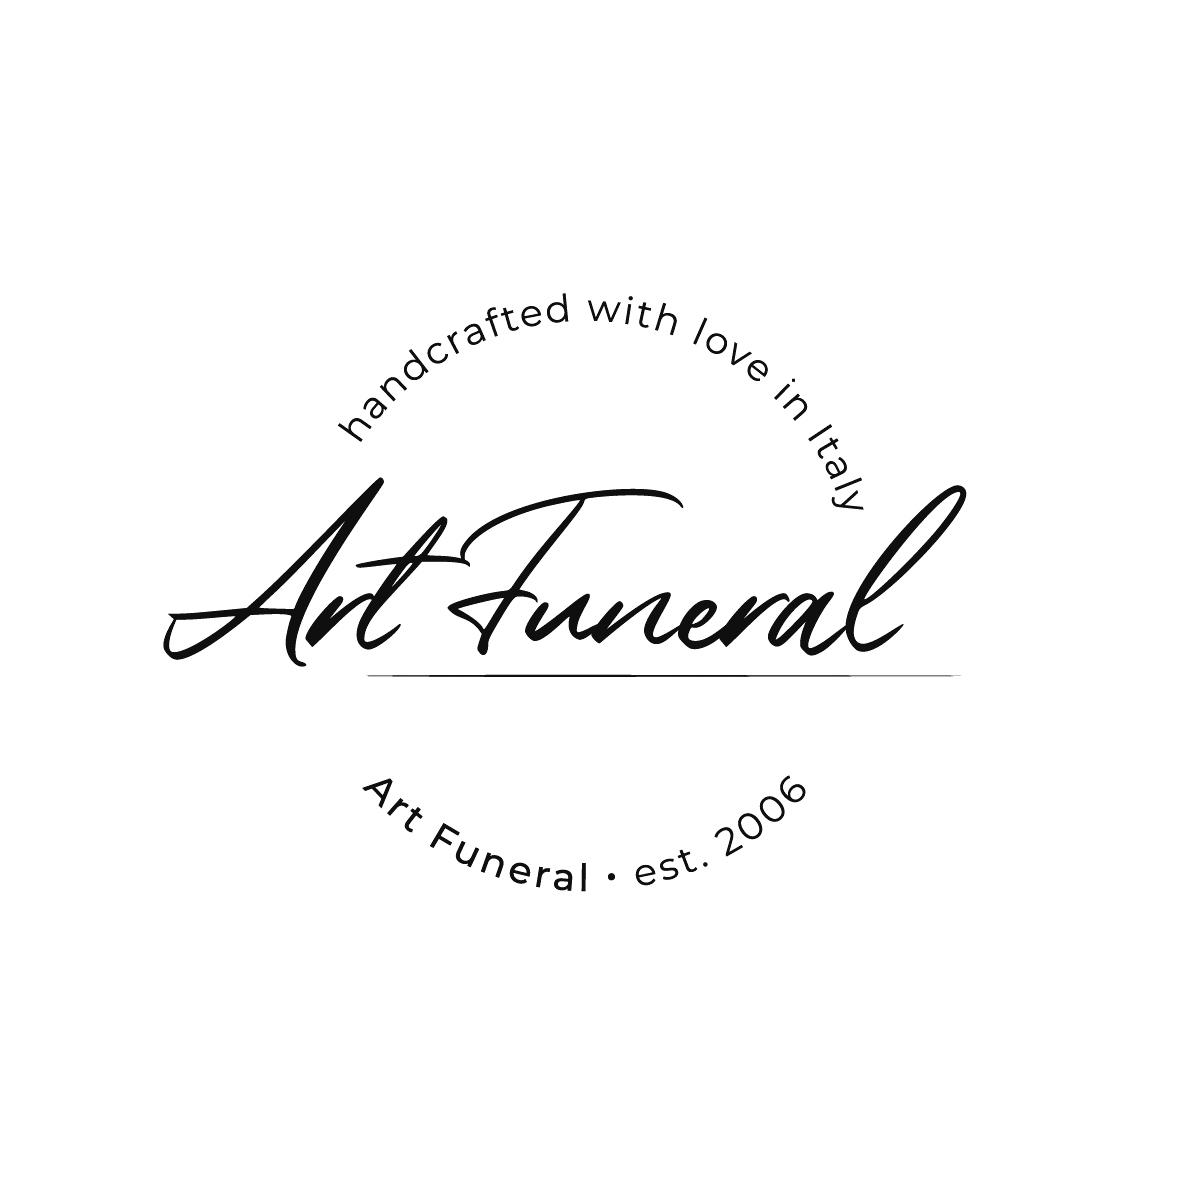 Bildmarke: art funeral handcrafted with love in Italy est. 2006